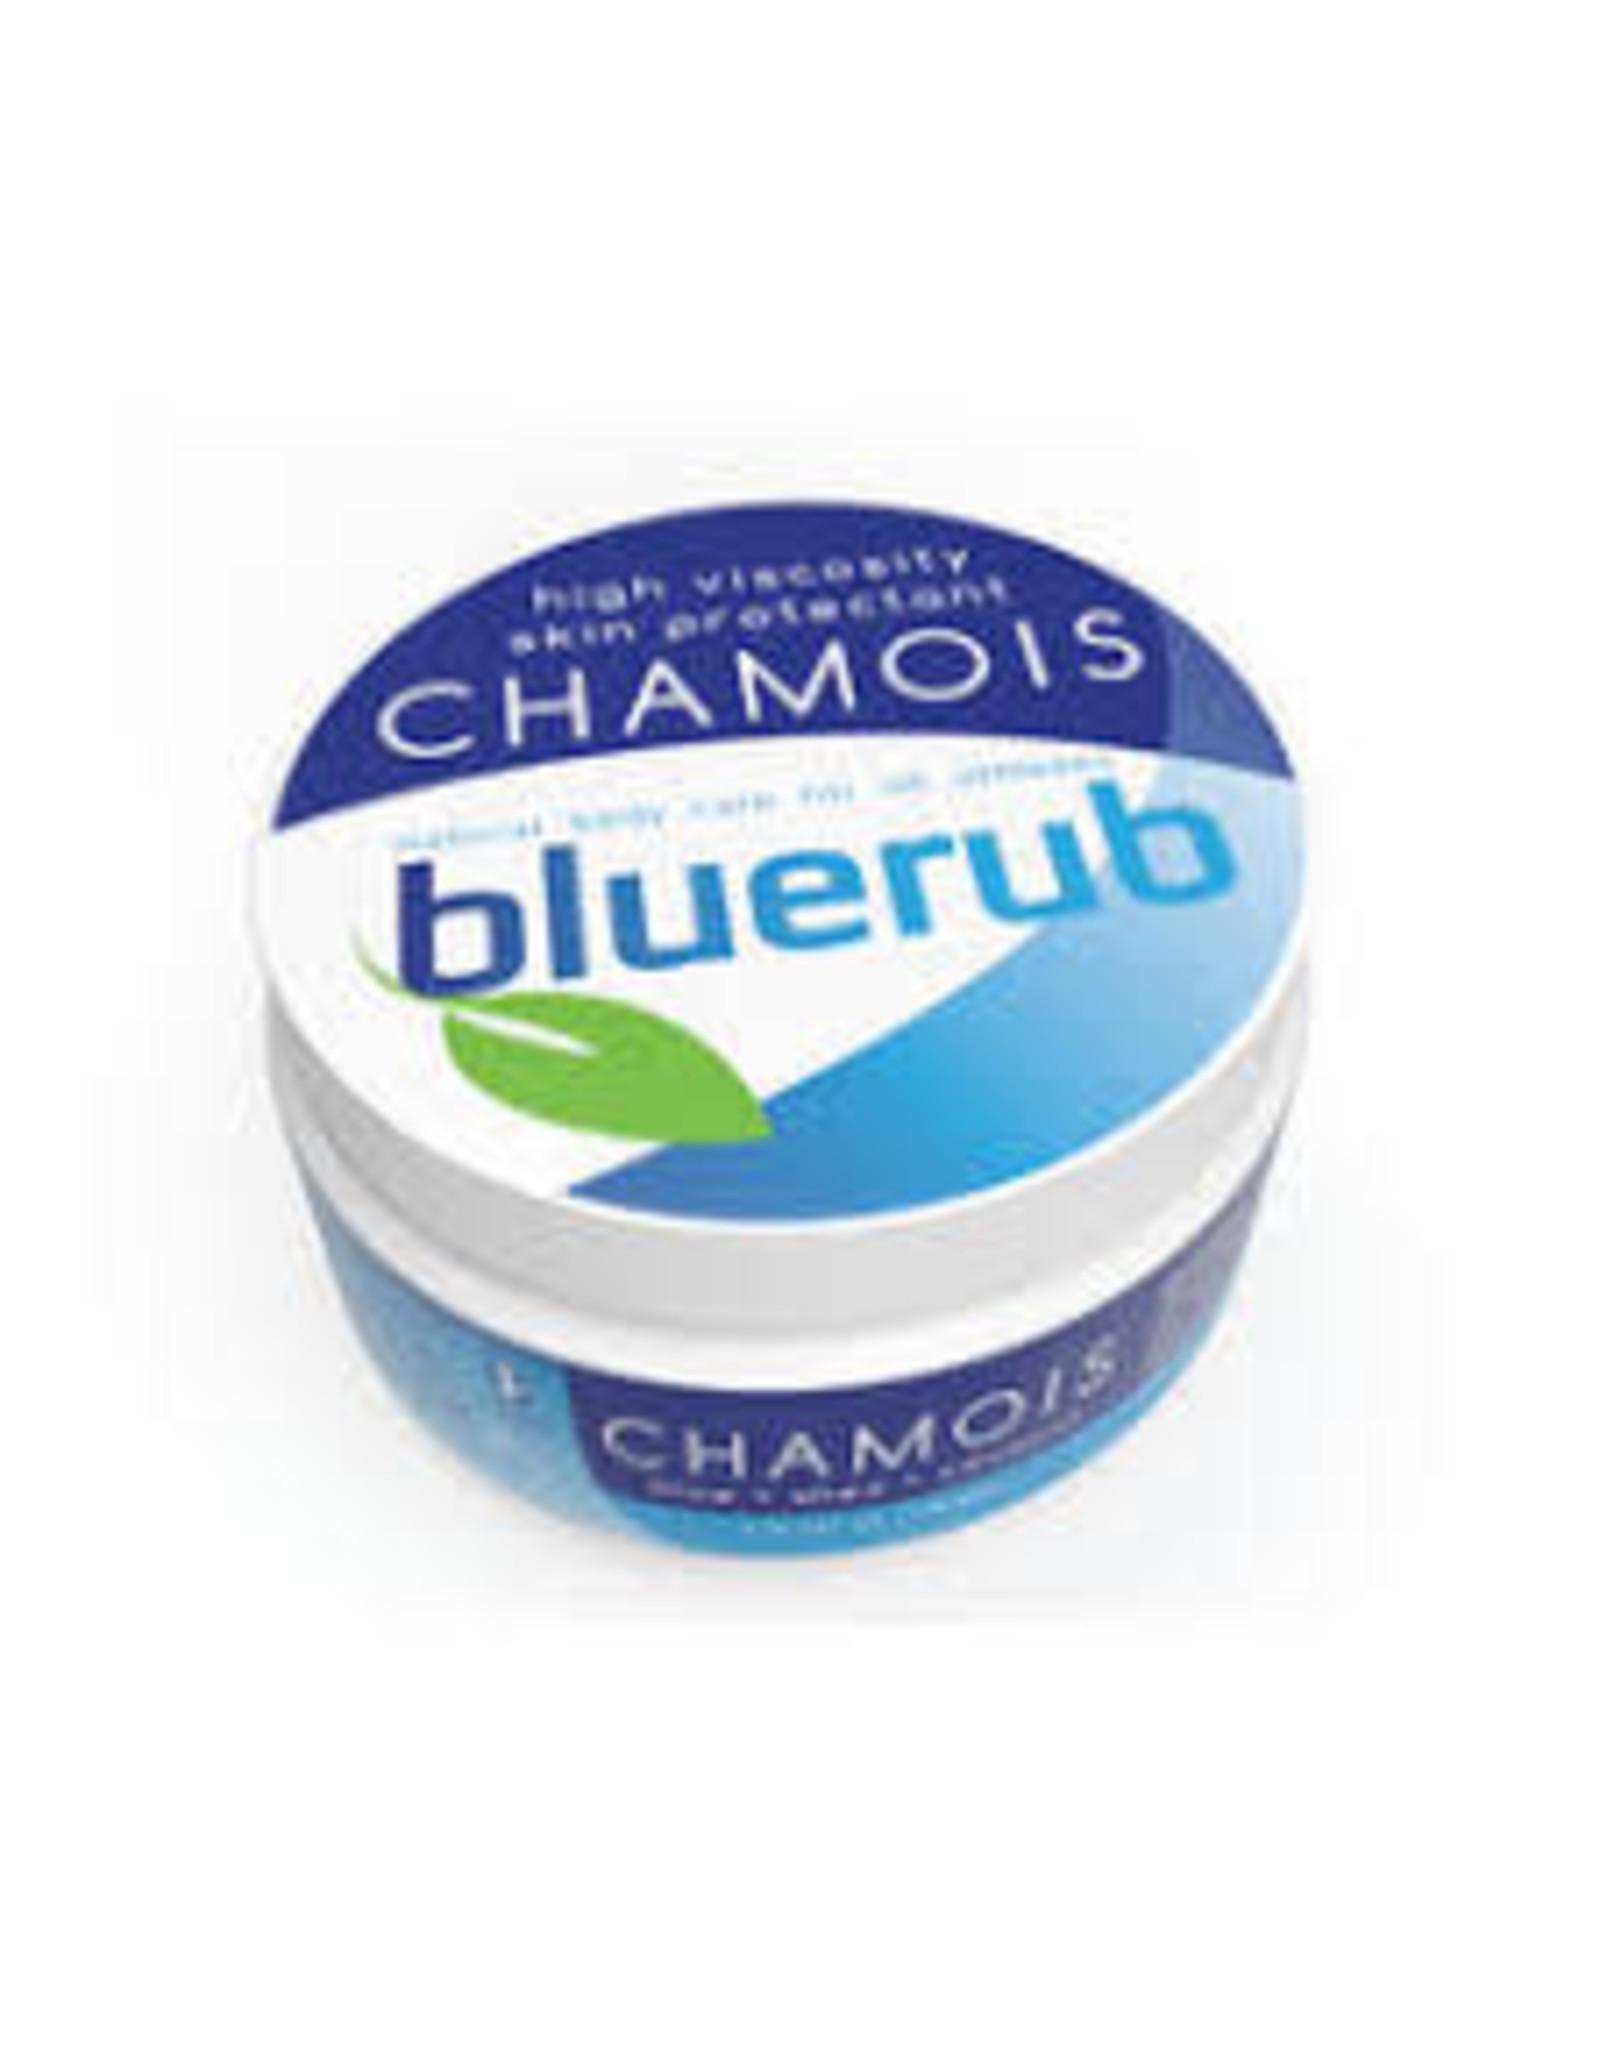 Bluerub Hand Cream Bluerub Jar 2 OZ.